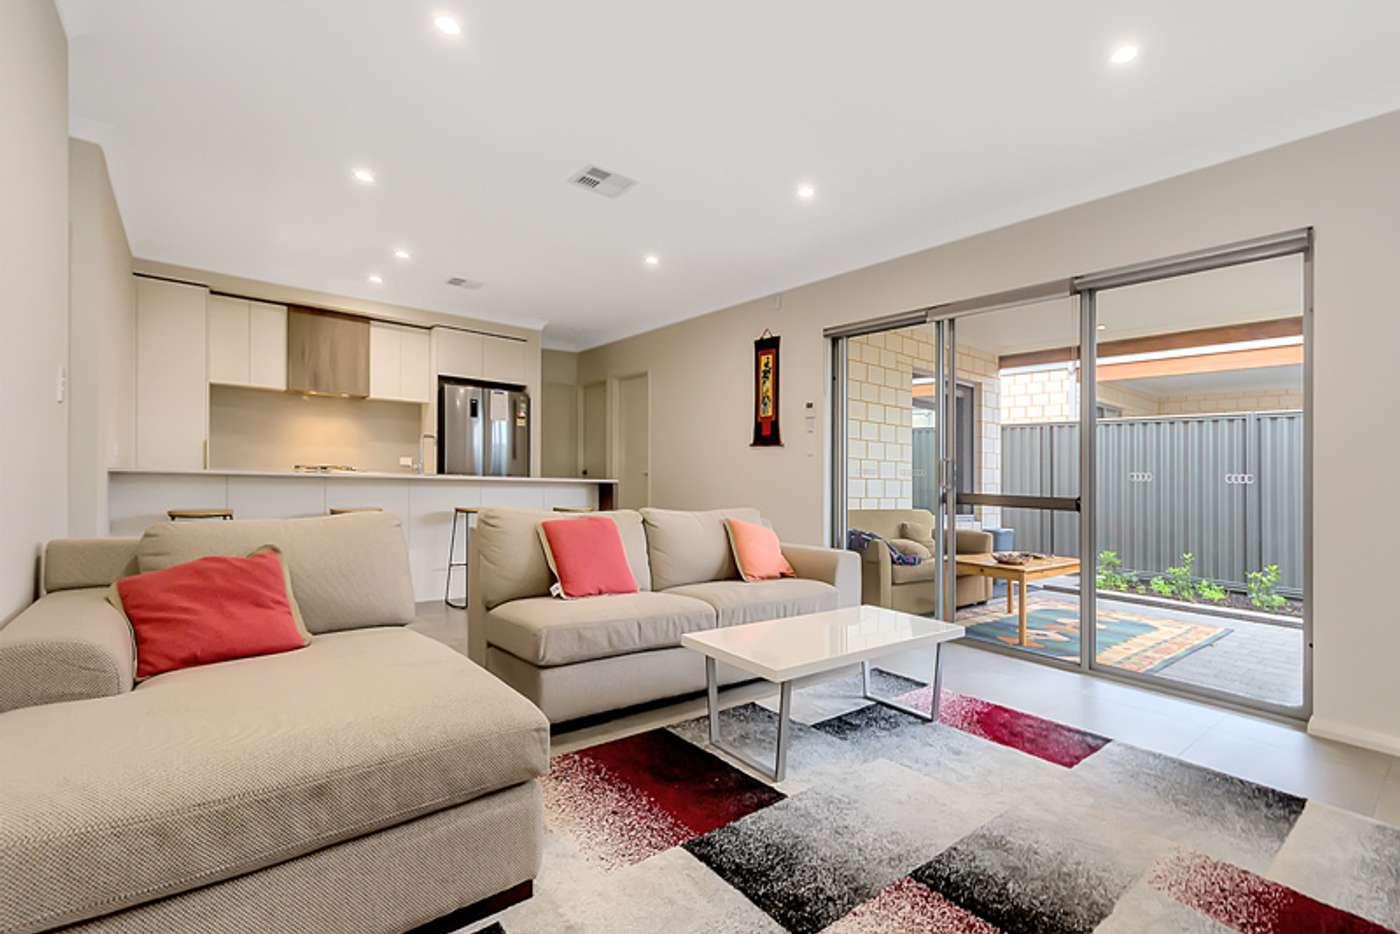 Main view of Homely house listing, 6 Minigwal Loop, Hammond Park WA 6164